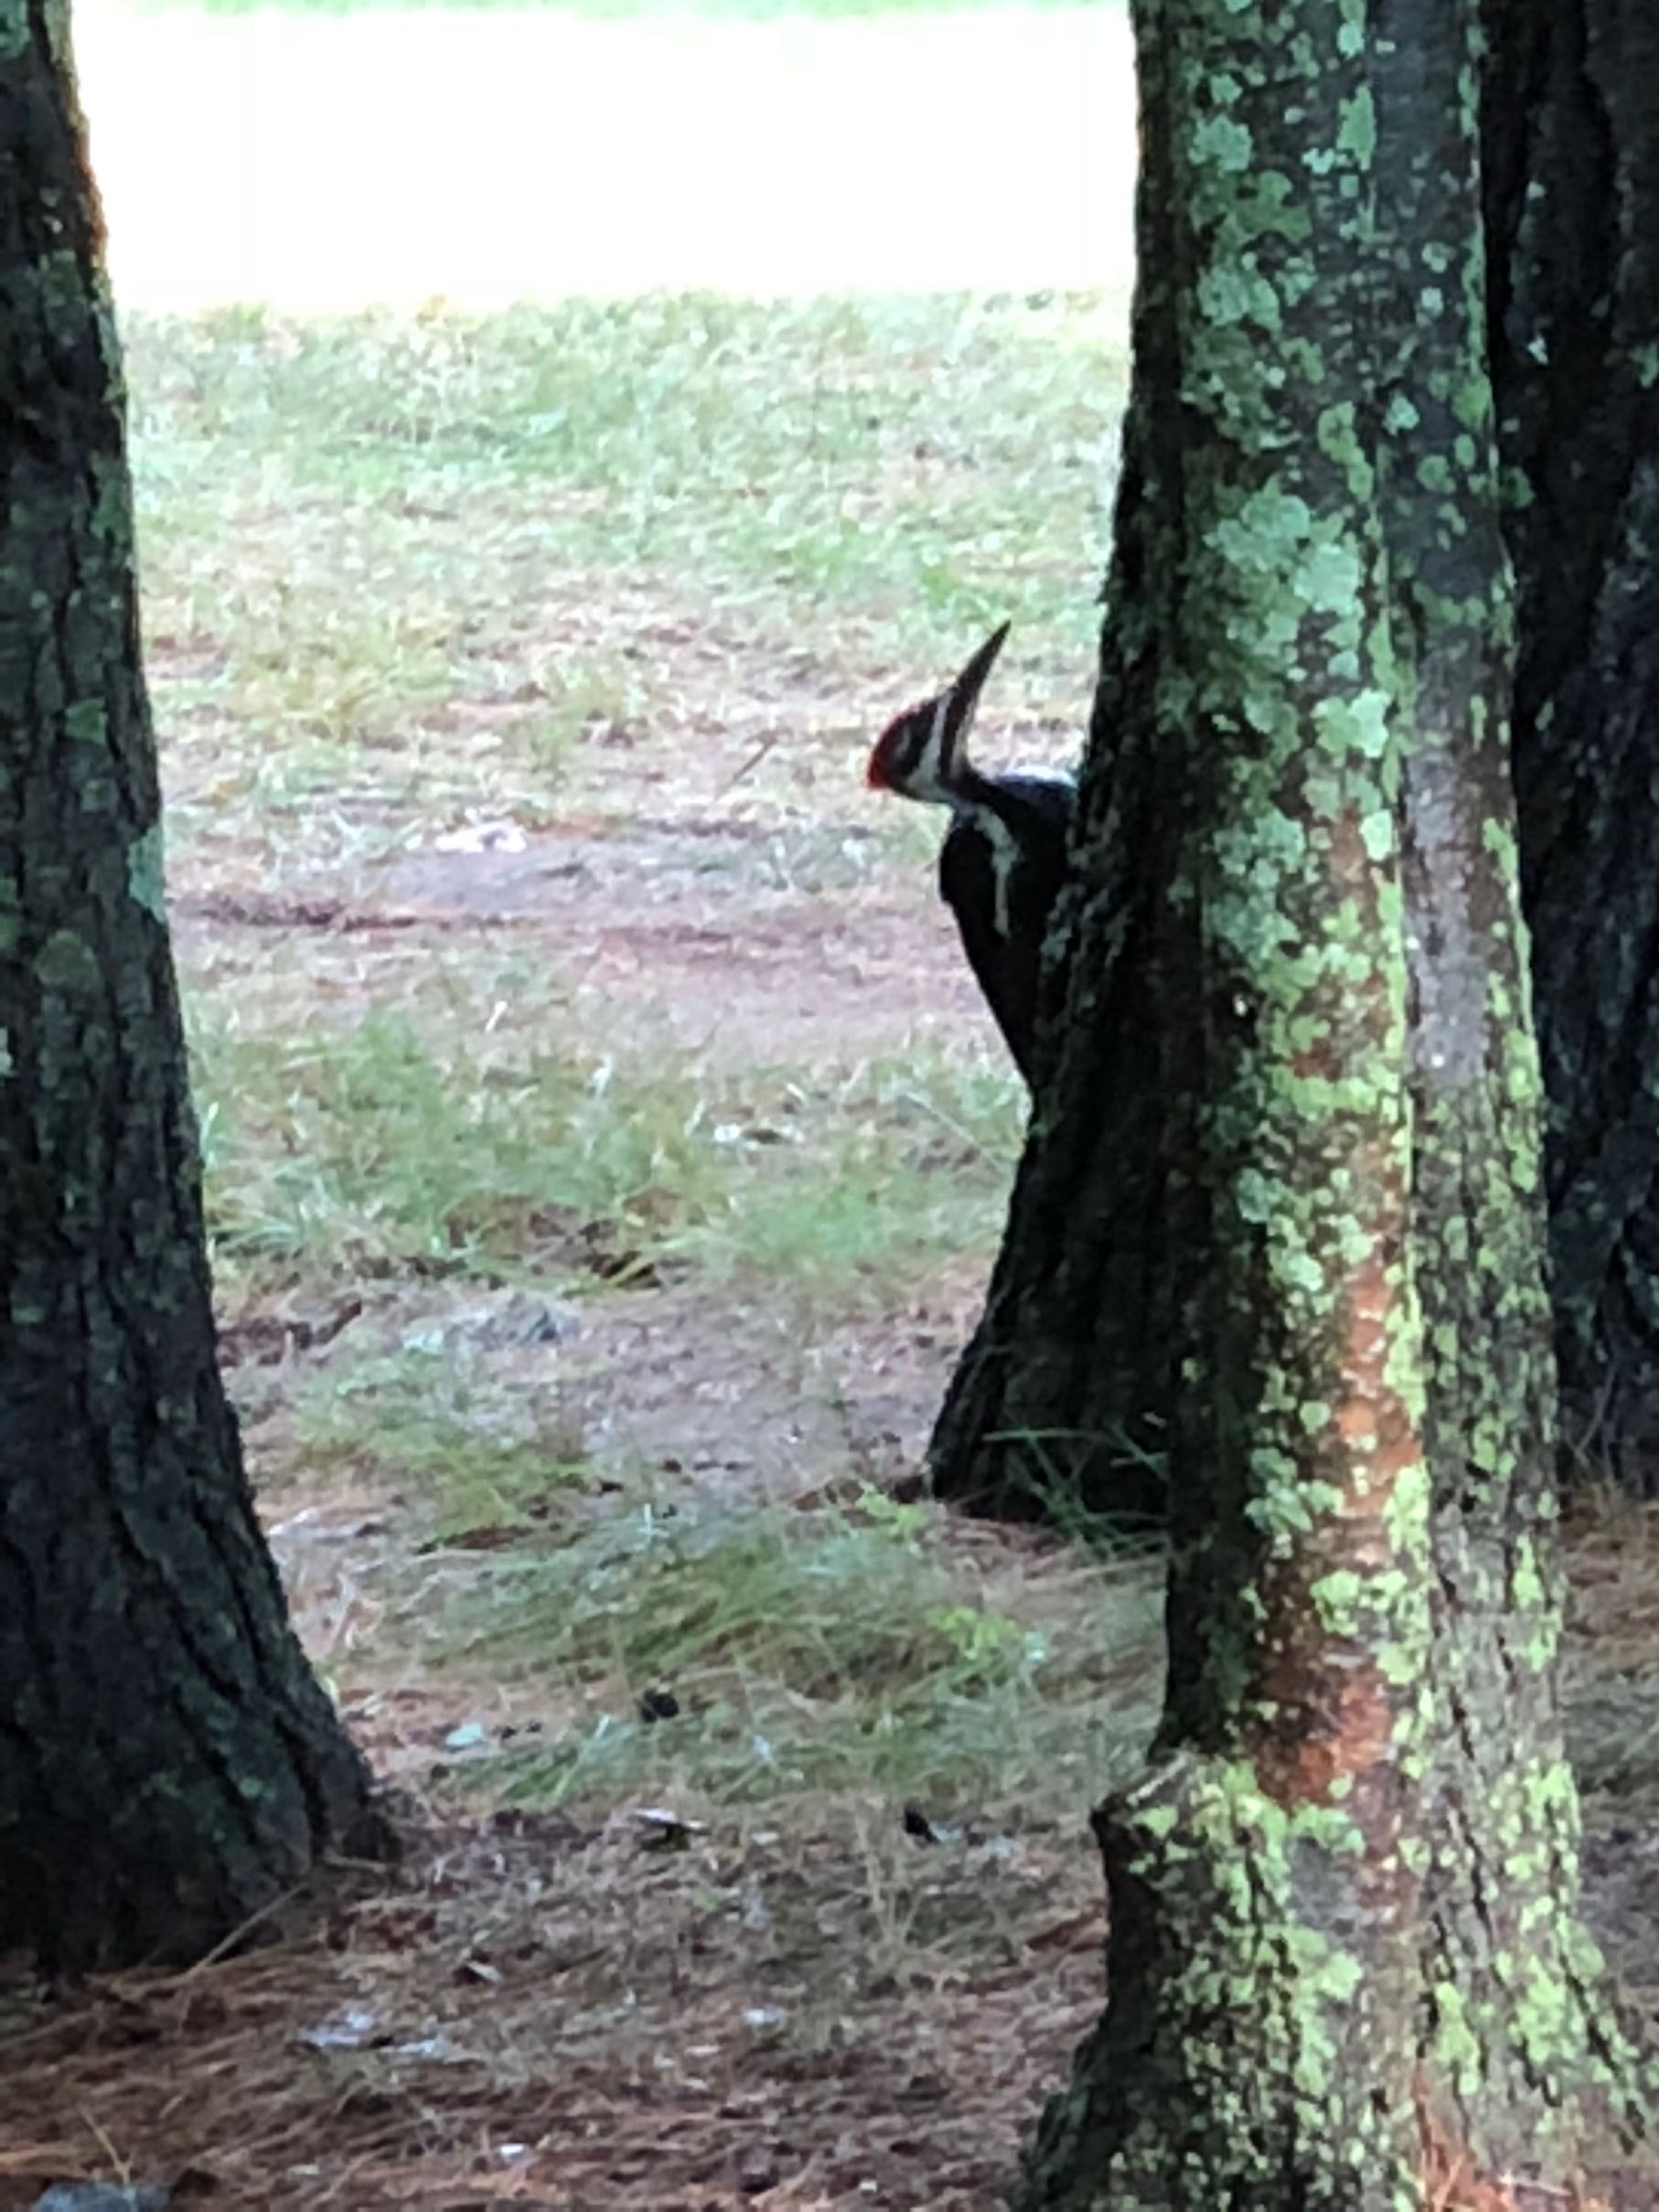 9pileatedwoodpecker